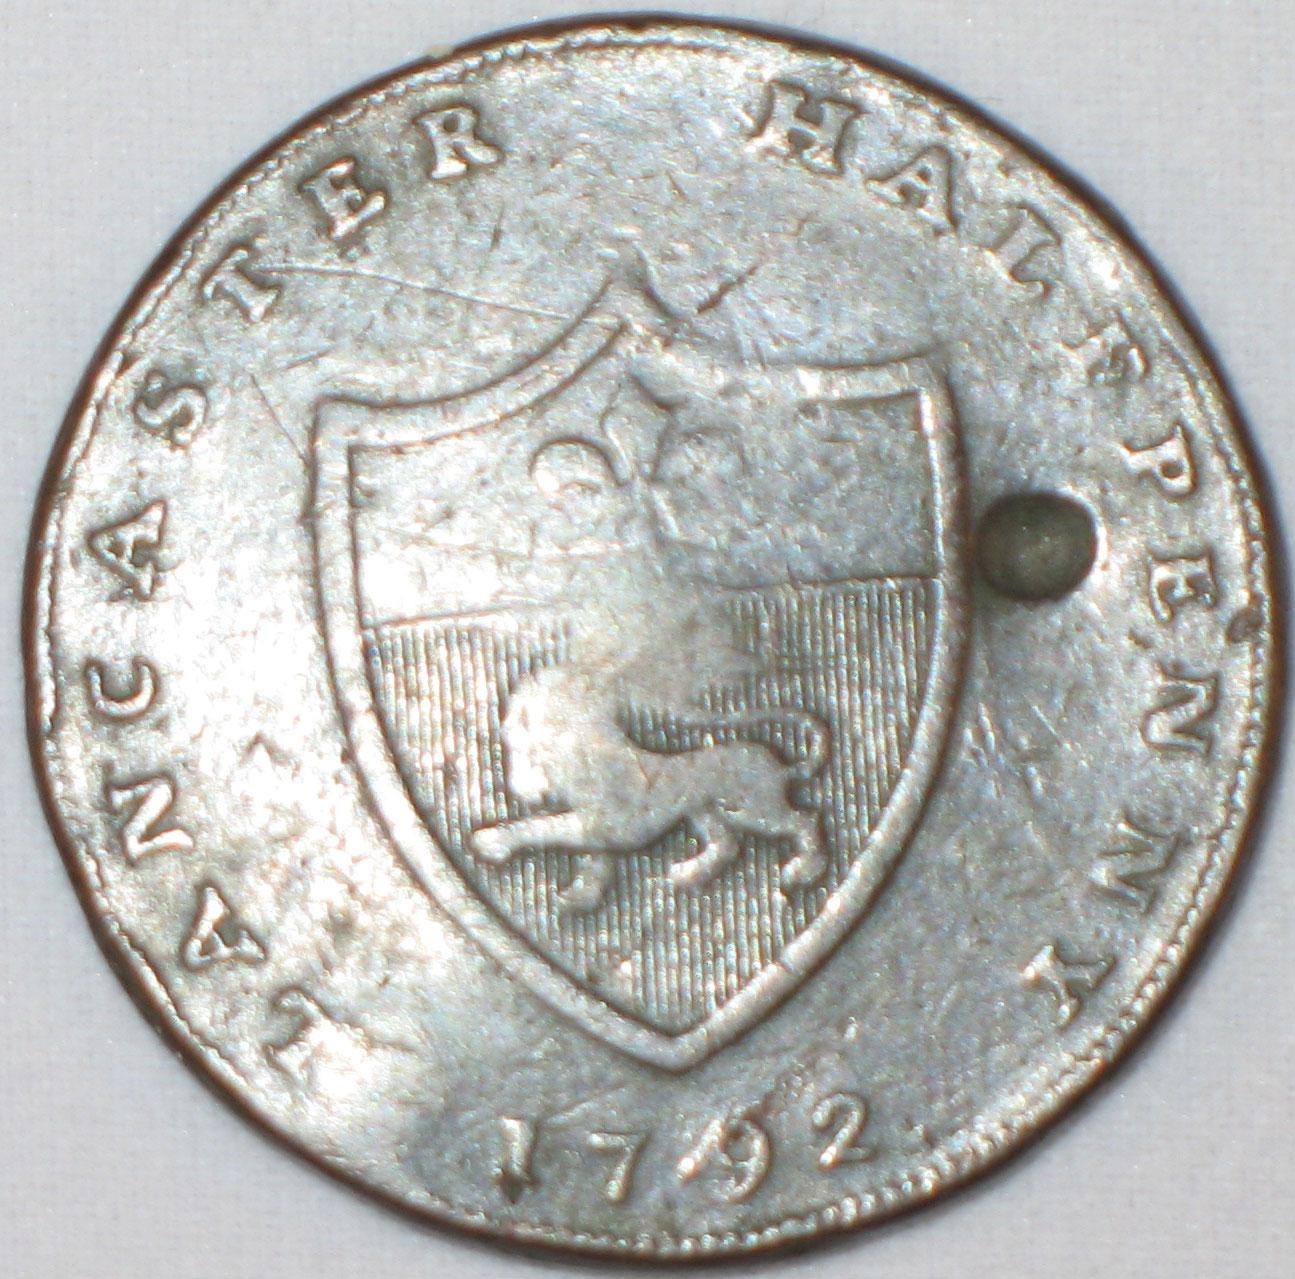 Iohn of Gaunt, Duke of Lancaster, Halfpenny token, 1792